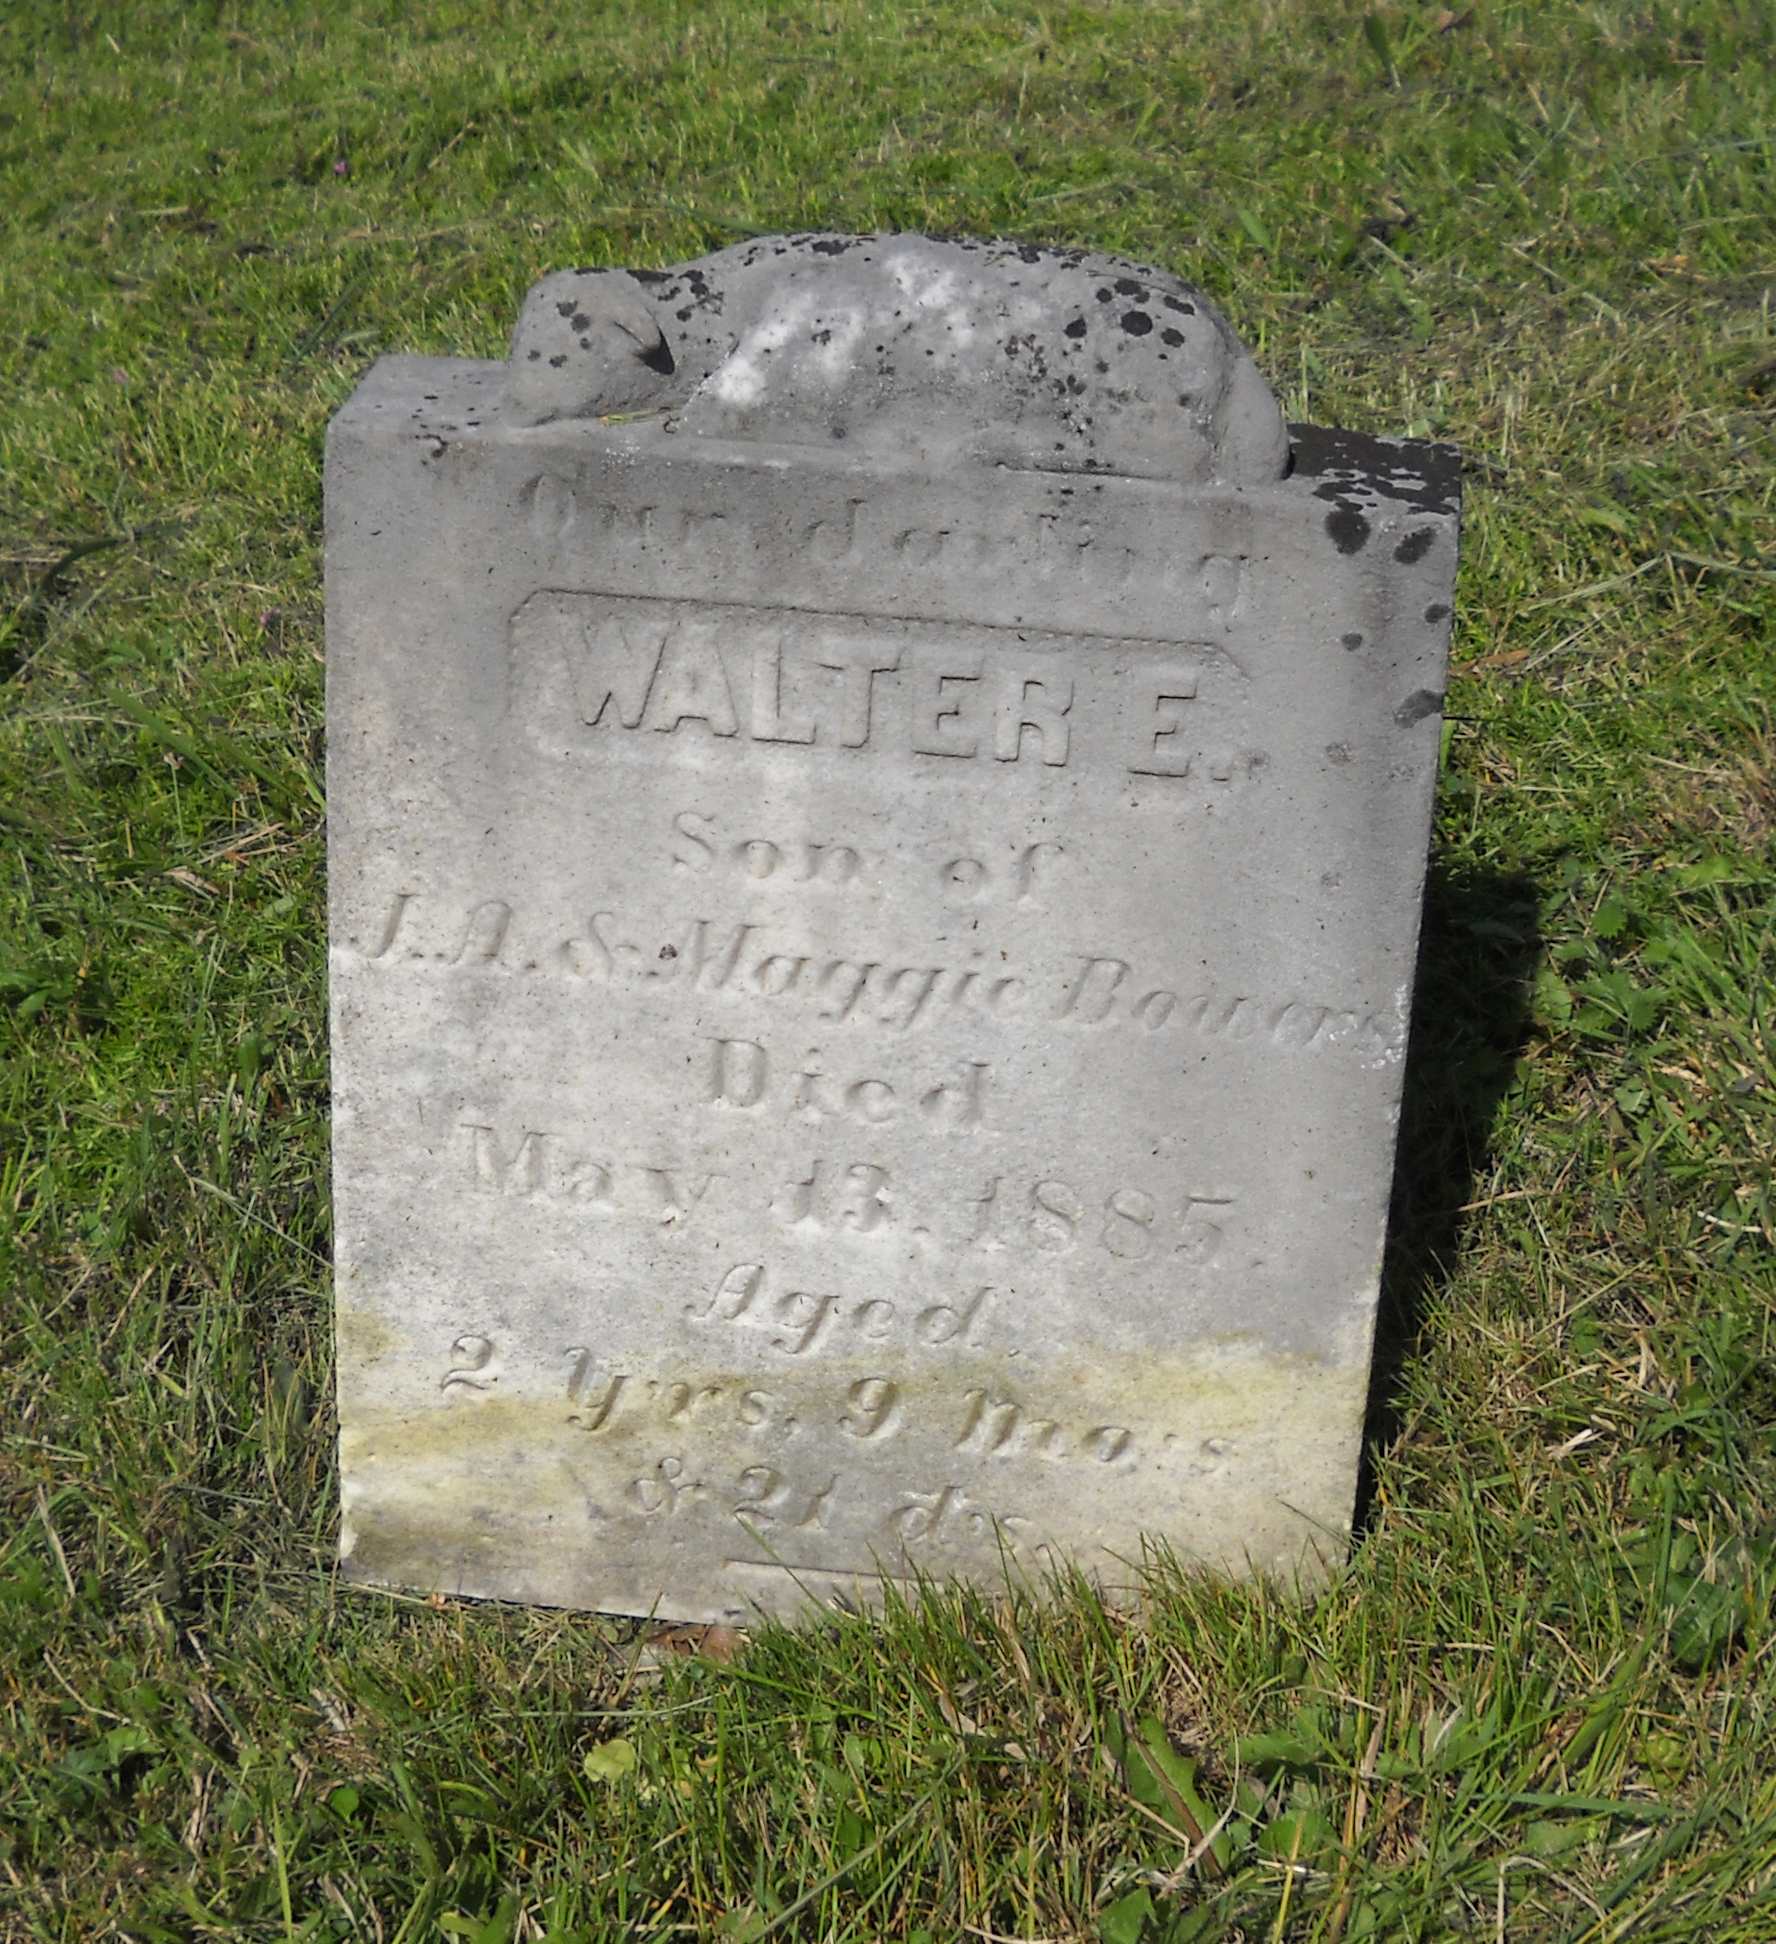 Walter E Bowers